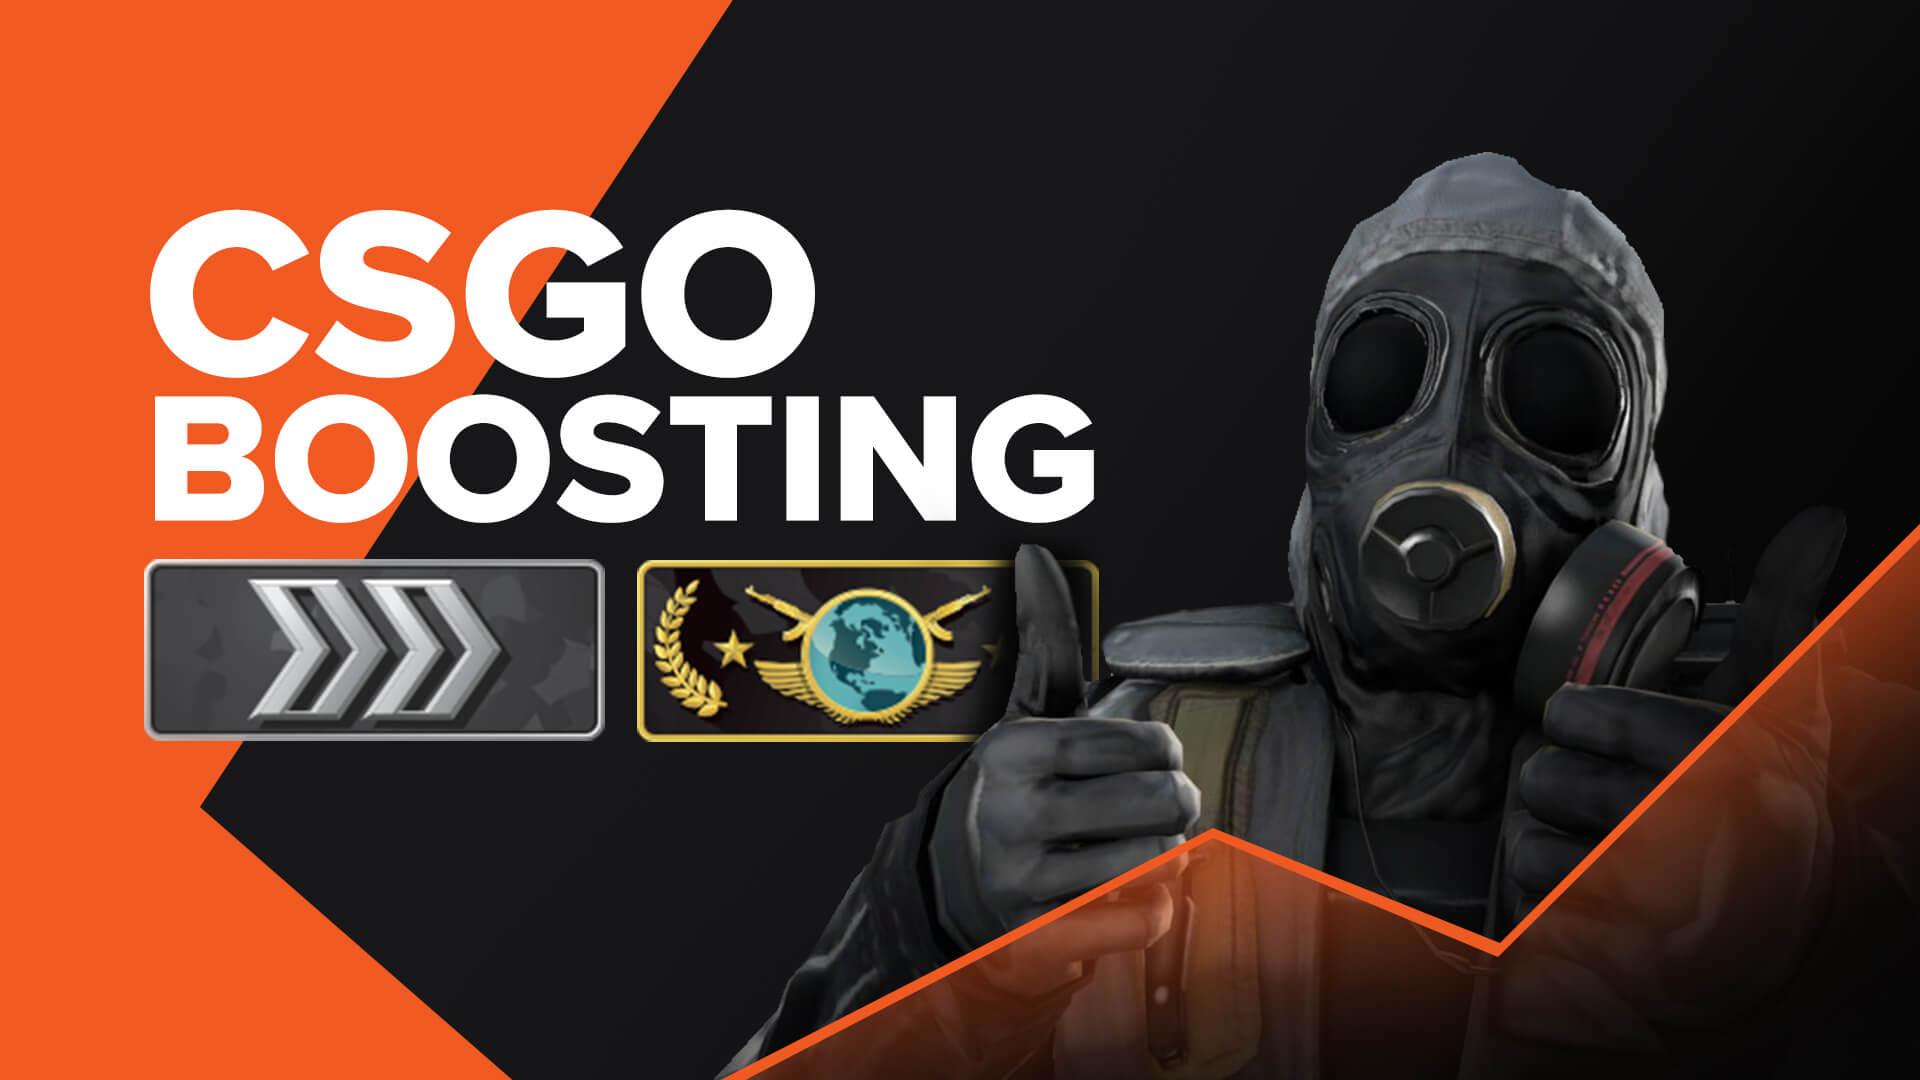 CS:GO Rank Boosting Guide